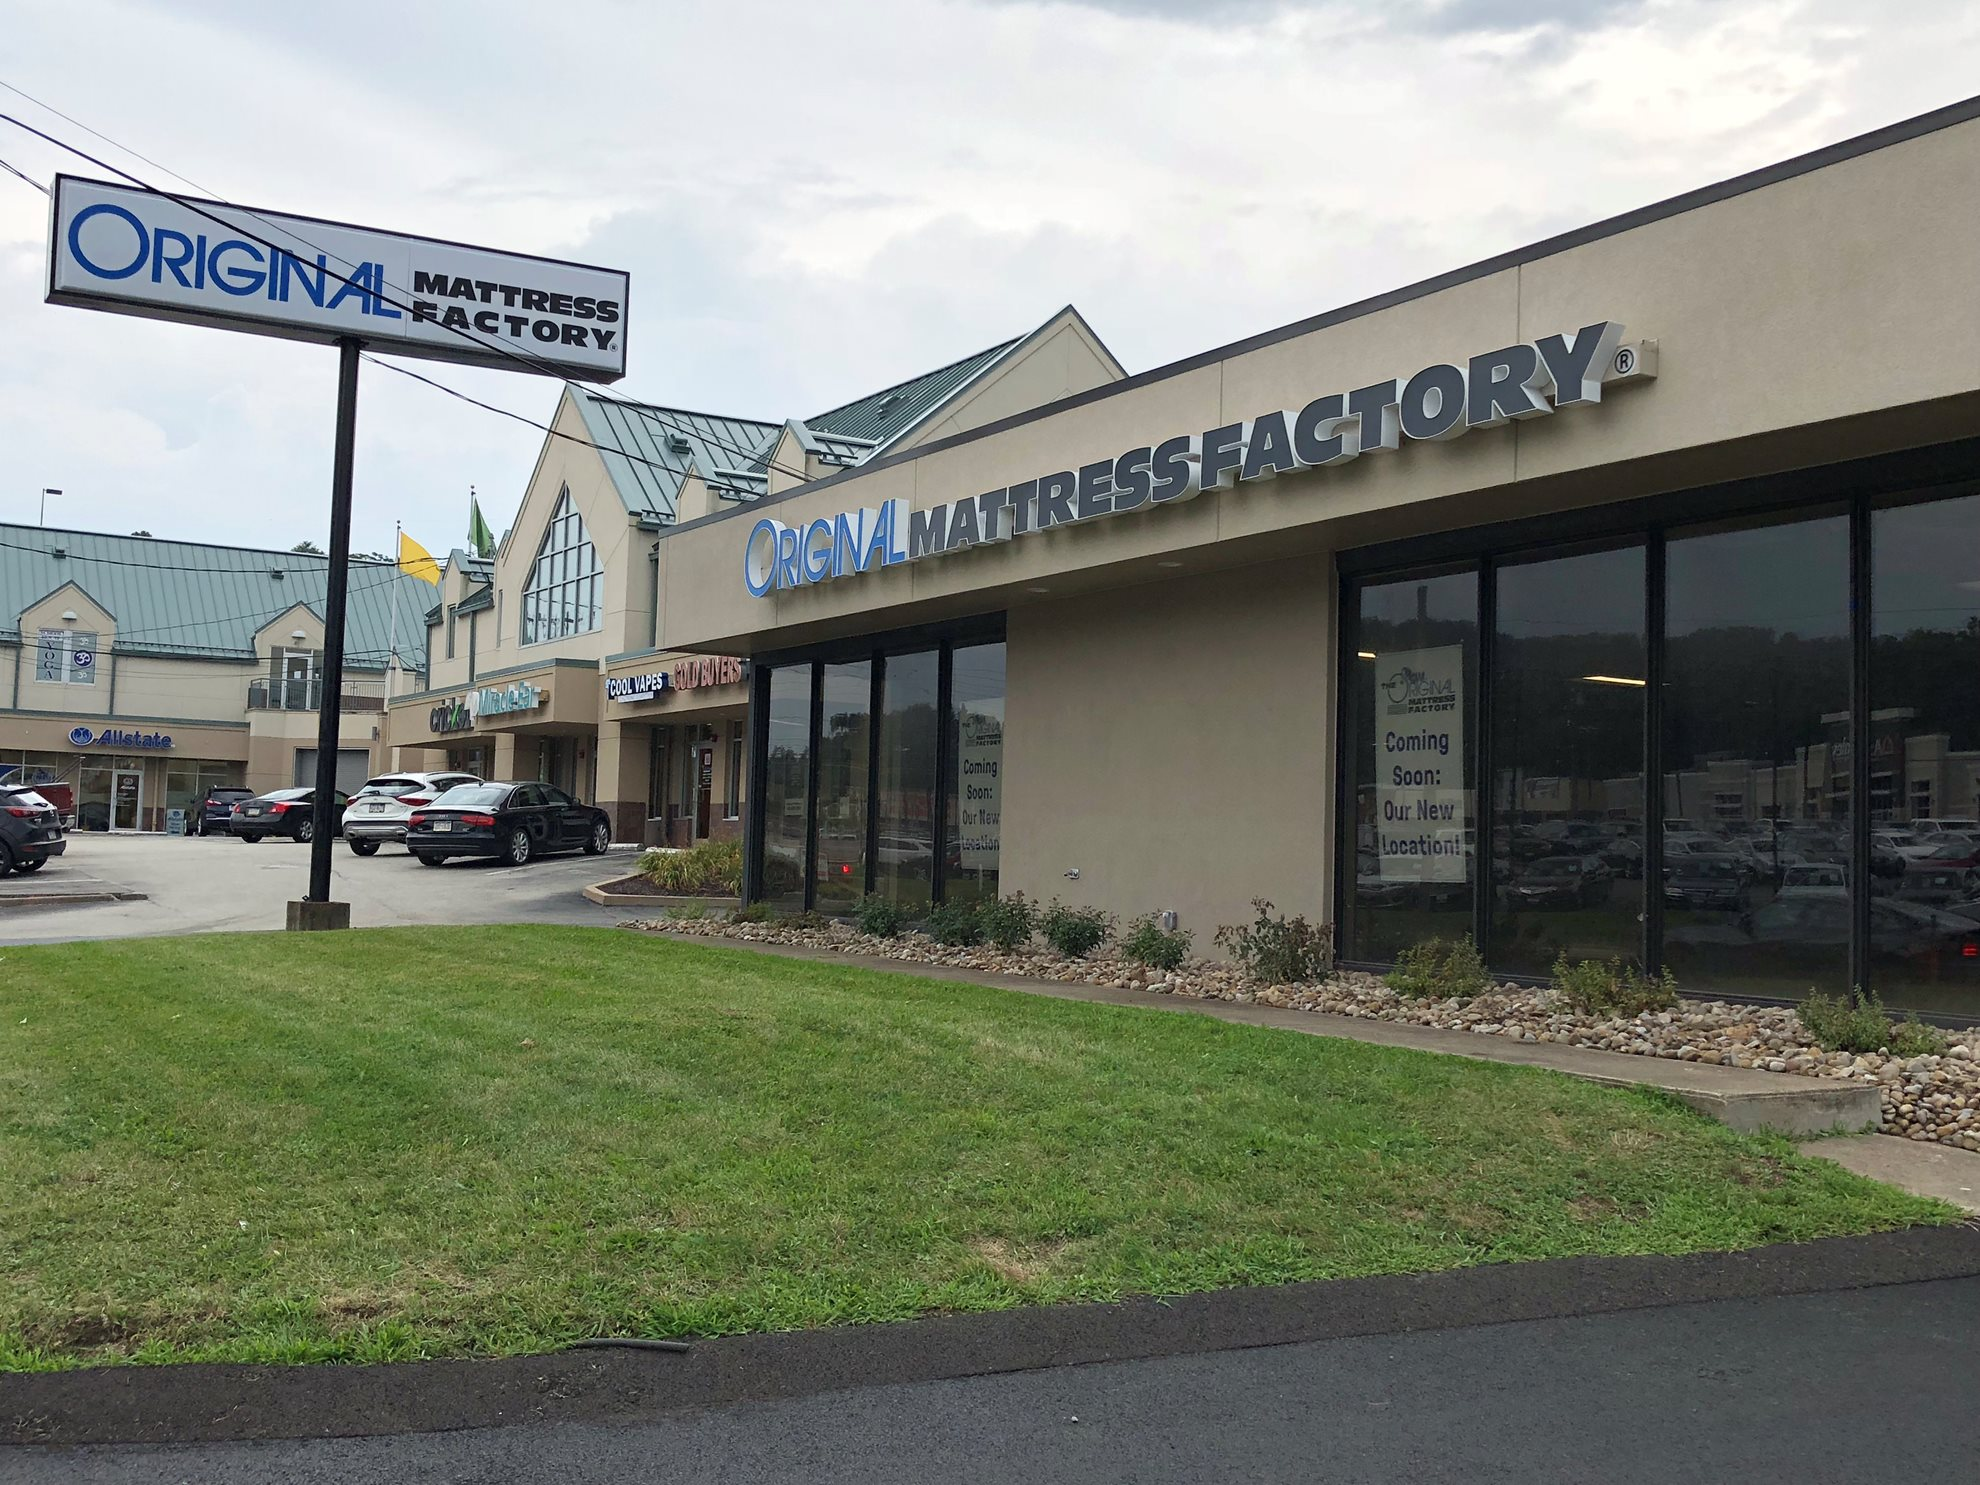 Jd Byrider Locations >> North Hills Pennsylvania Mattress Store   Original Mattress Factory